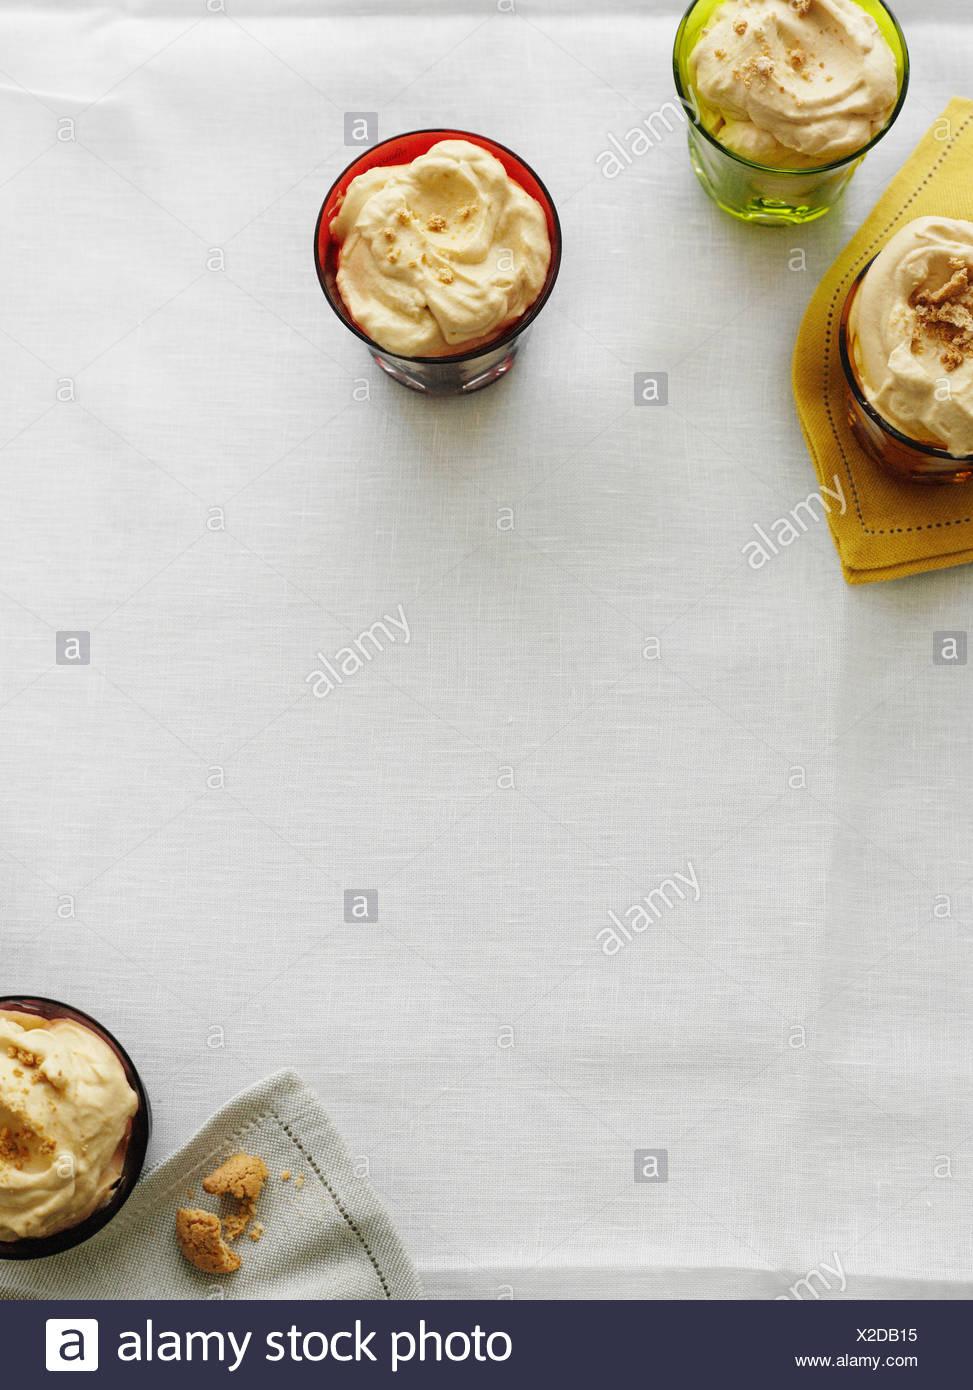 Bowls of angel delight dessert - Stock Image